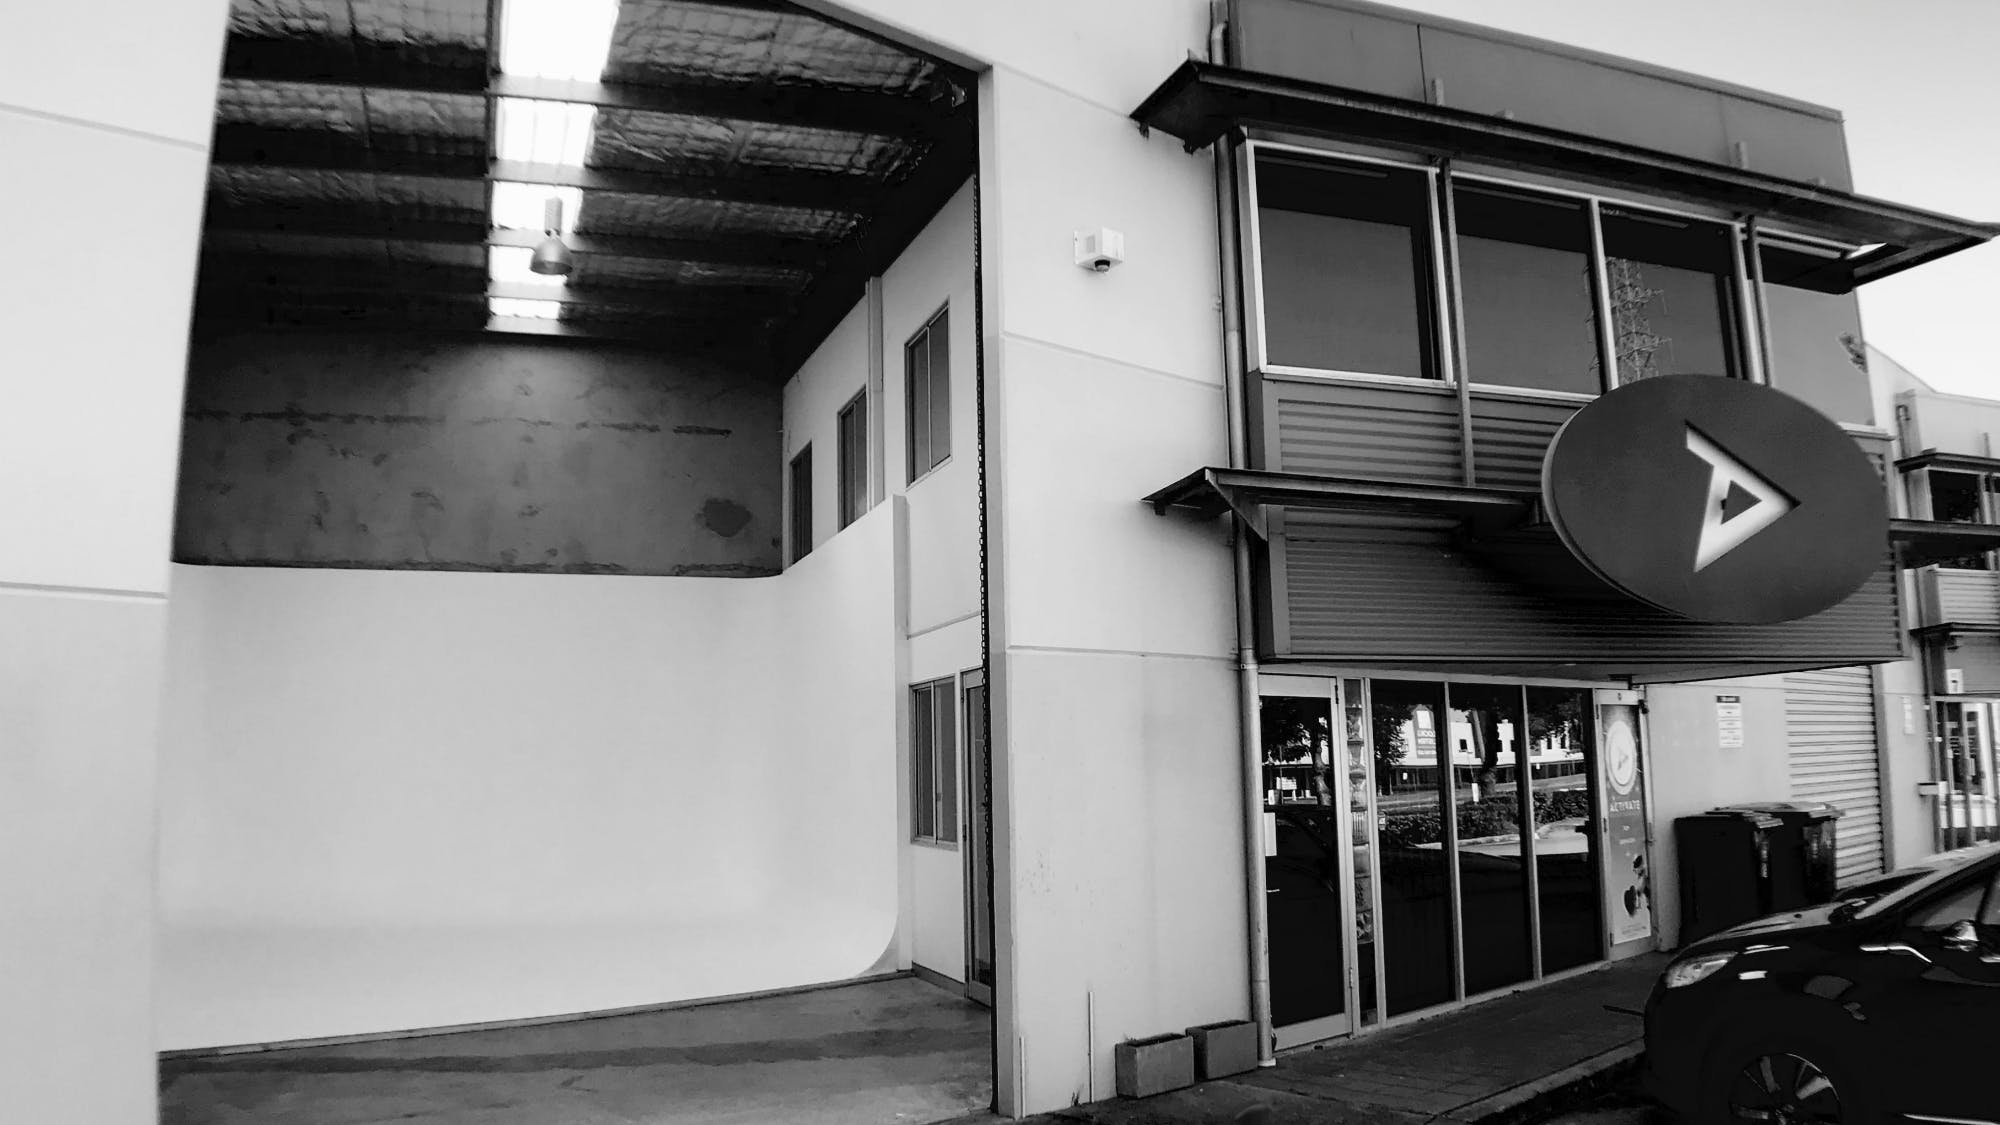 The Cyclorama & Studio, creative studio at Activate Studios, image 1